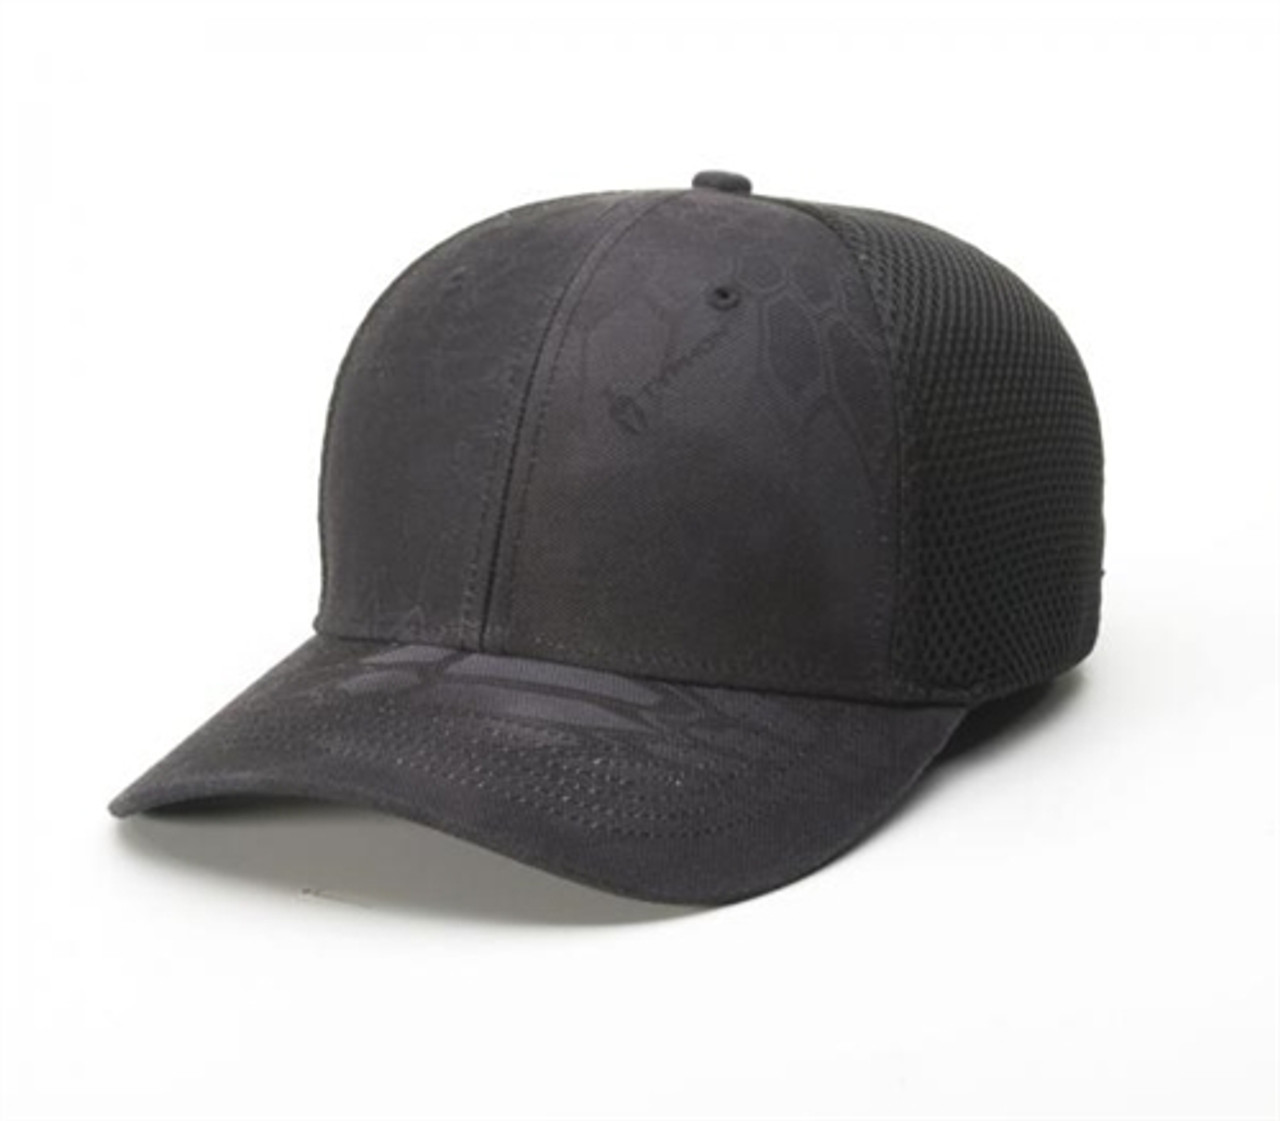 Embroidered Airmesh R-Flex Cap